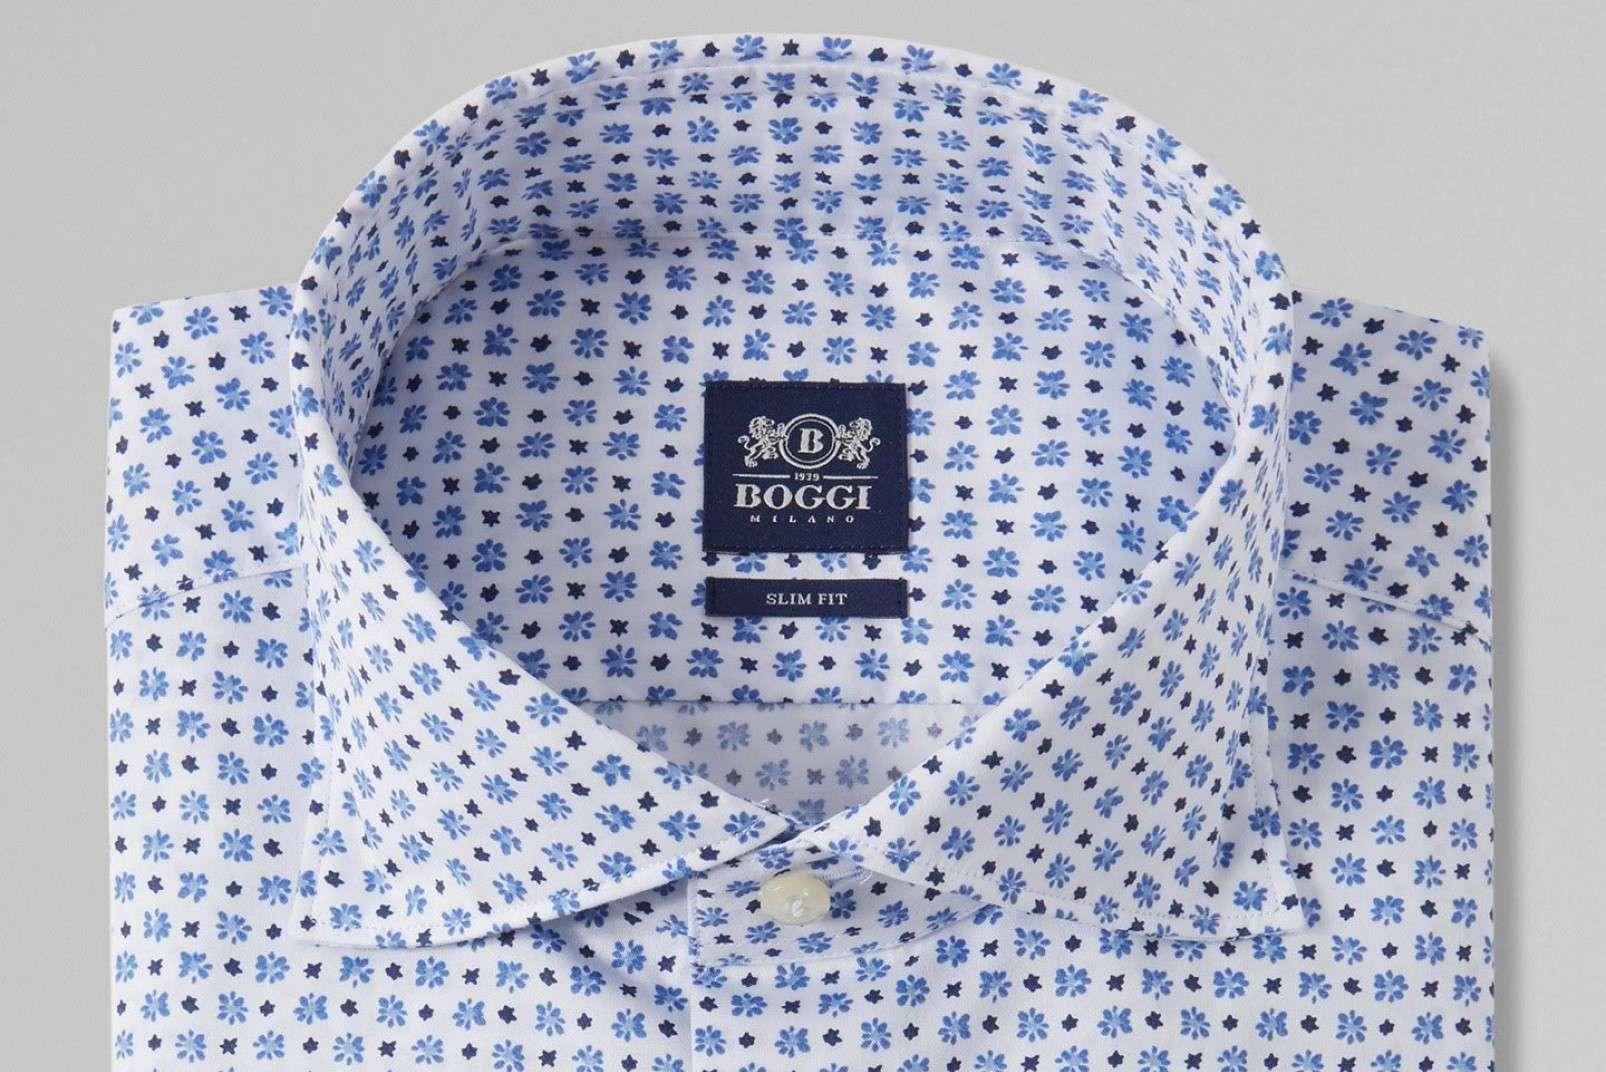 Floral print shirt BO19P036501